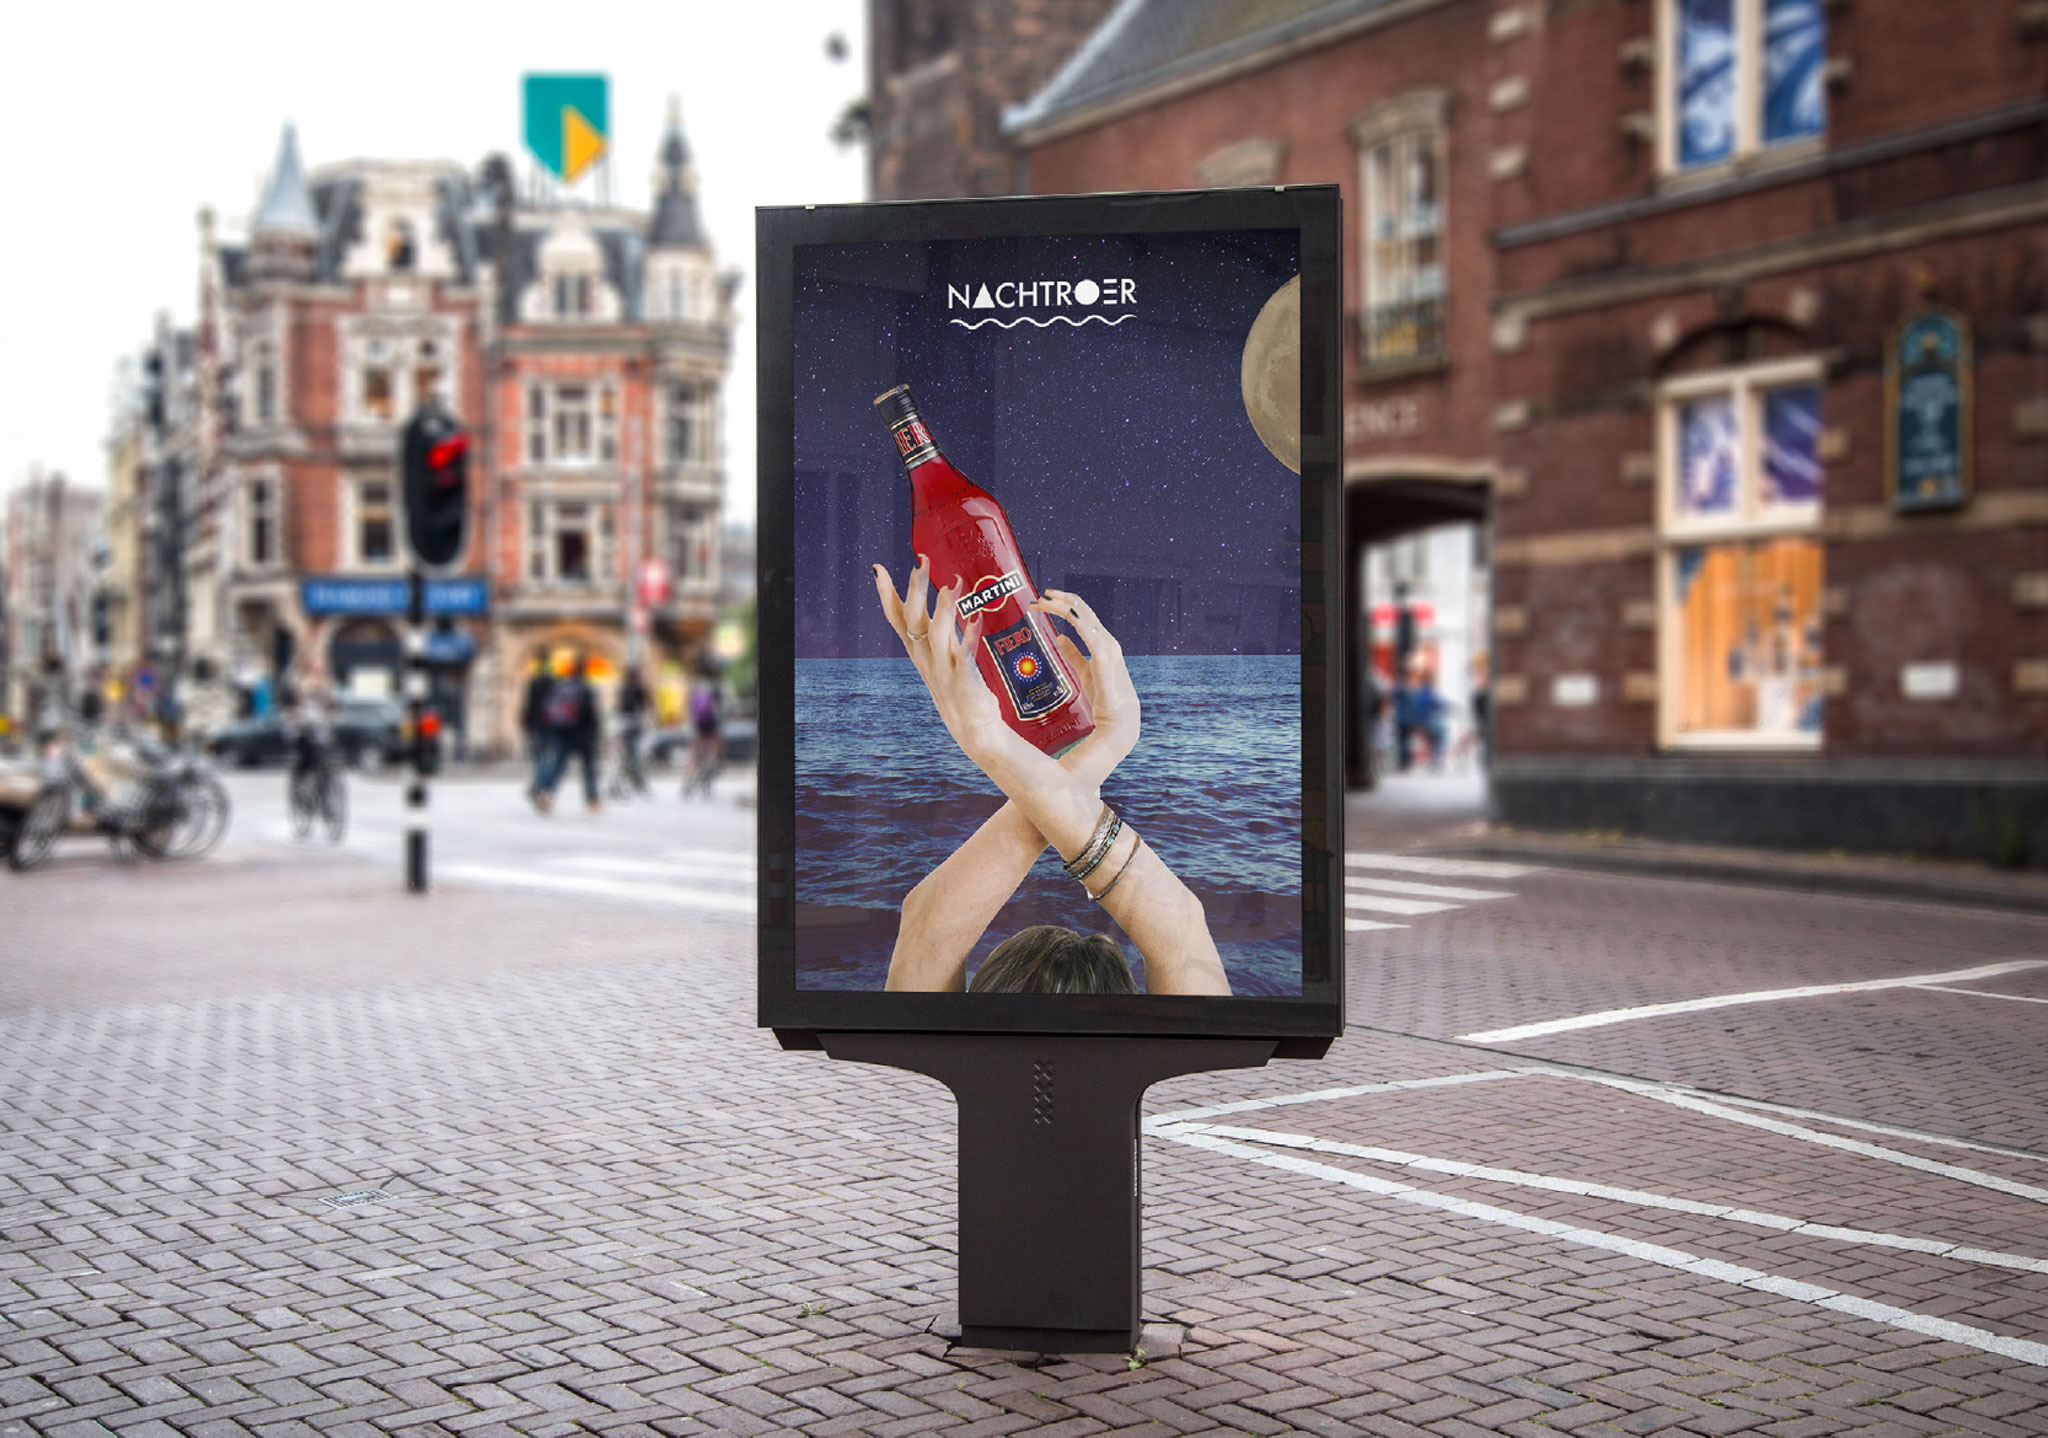 NACHTROER Posterstad